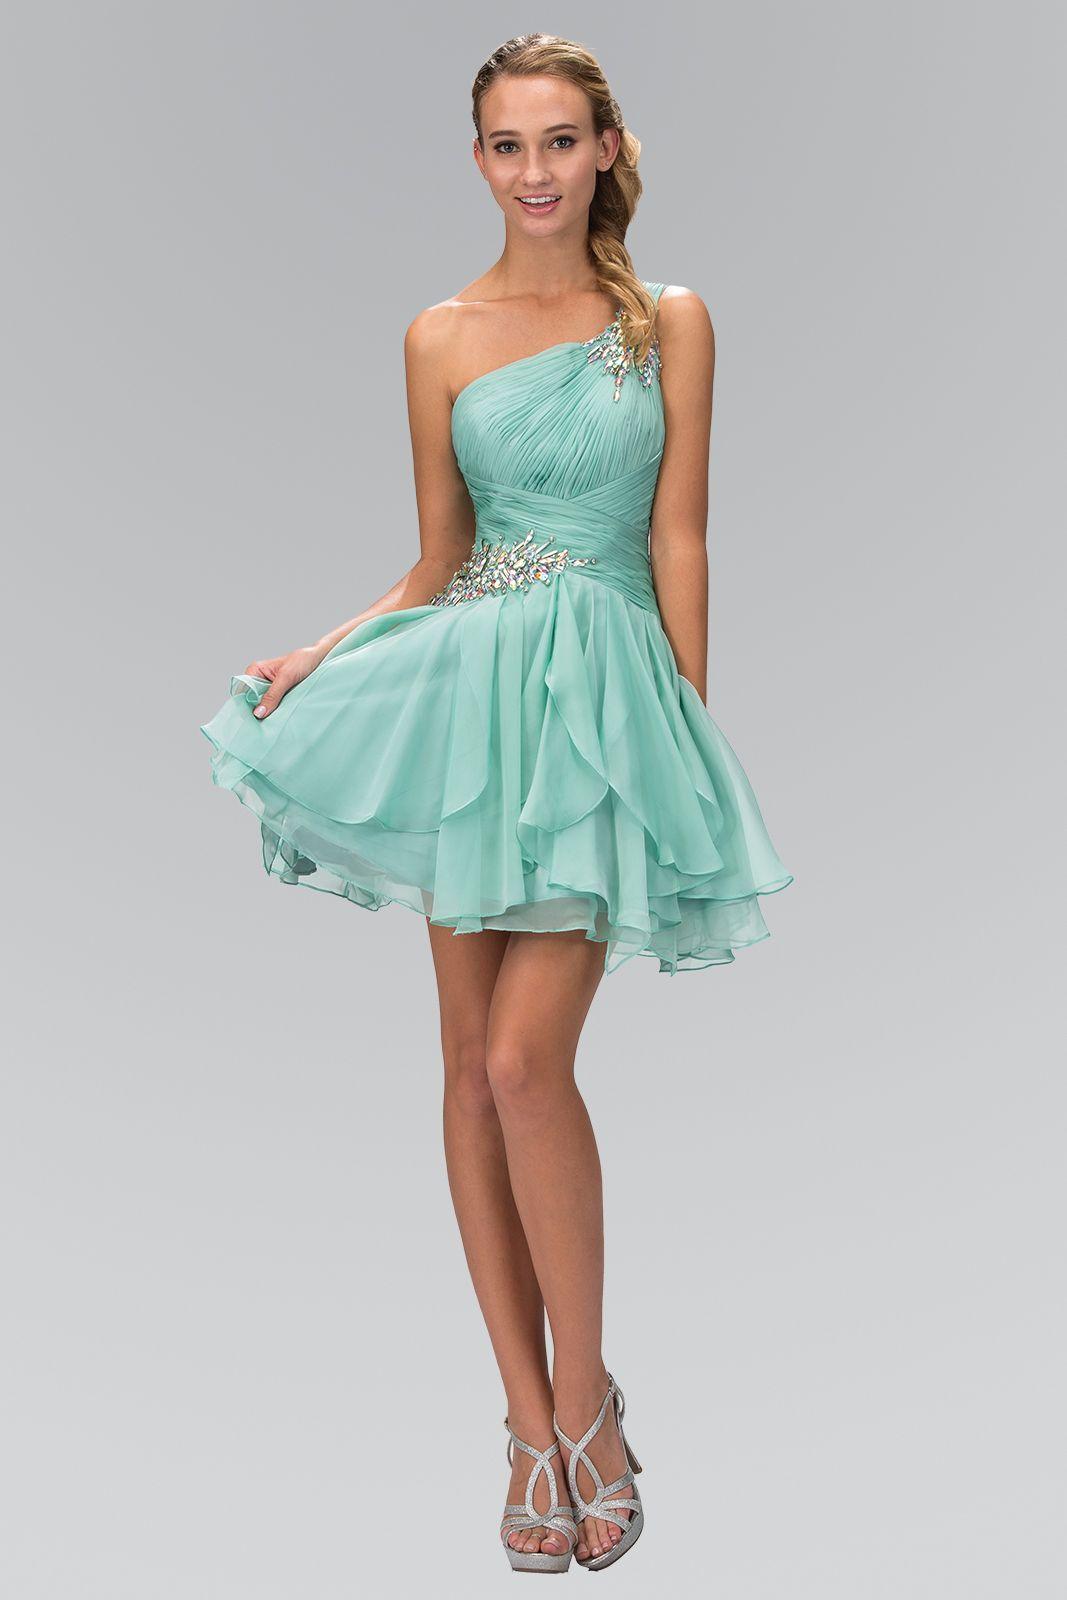 GLS APPAREL USA, INC - Dress Wholesale. GS1037 | Dresses | Pinterest ...